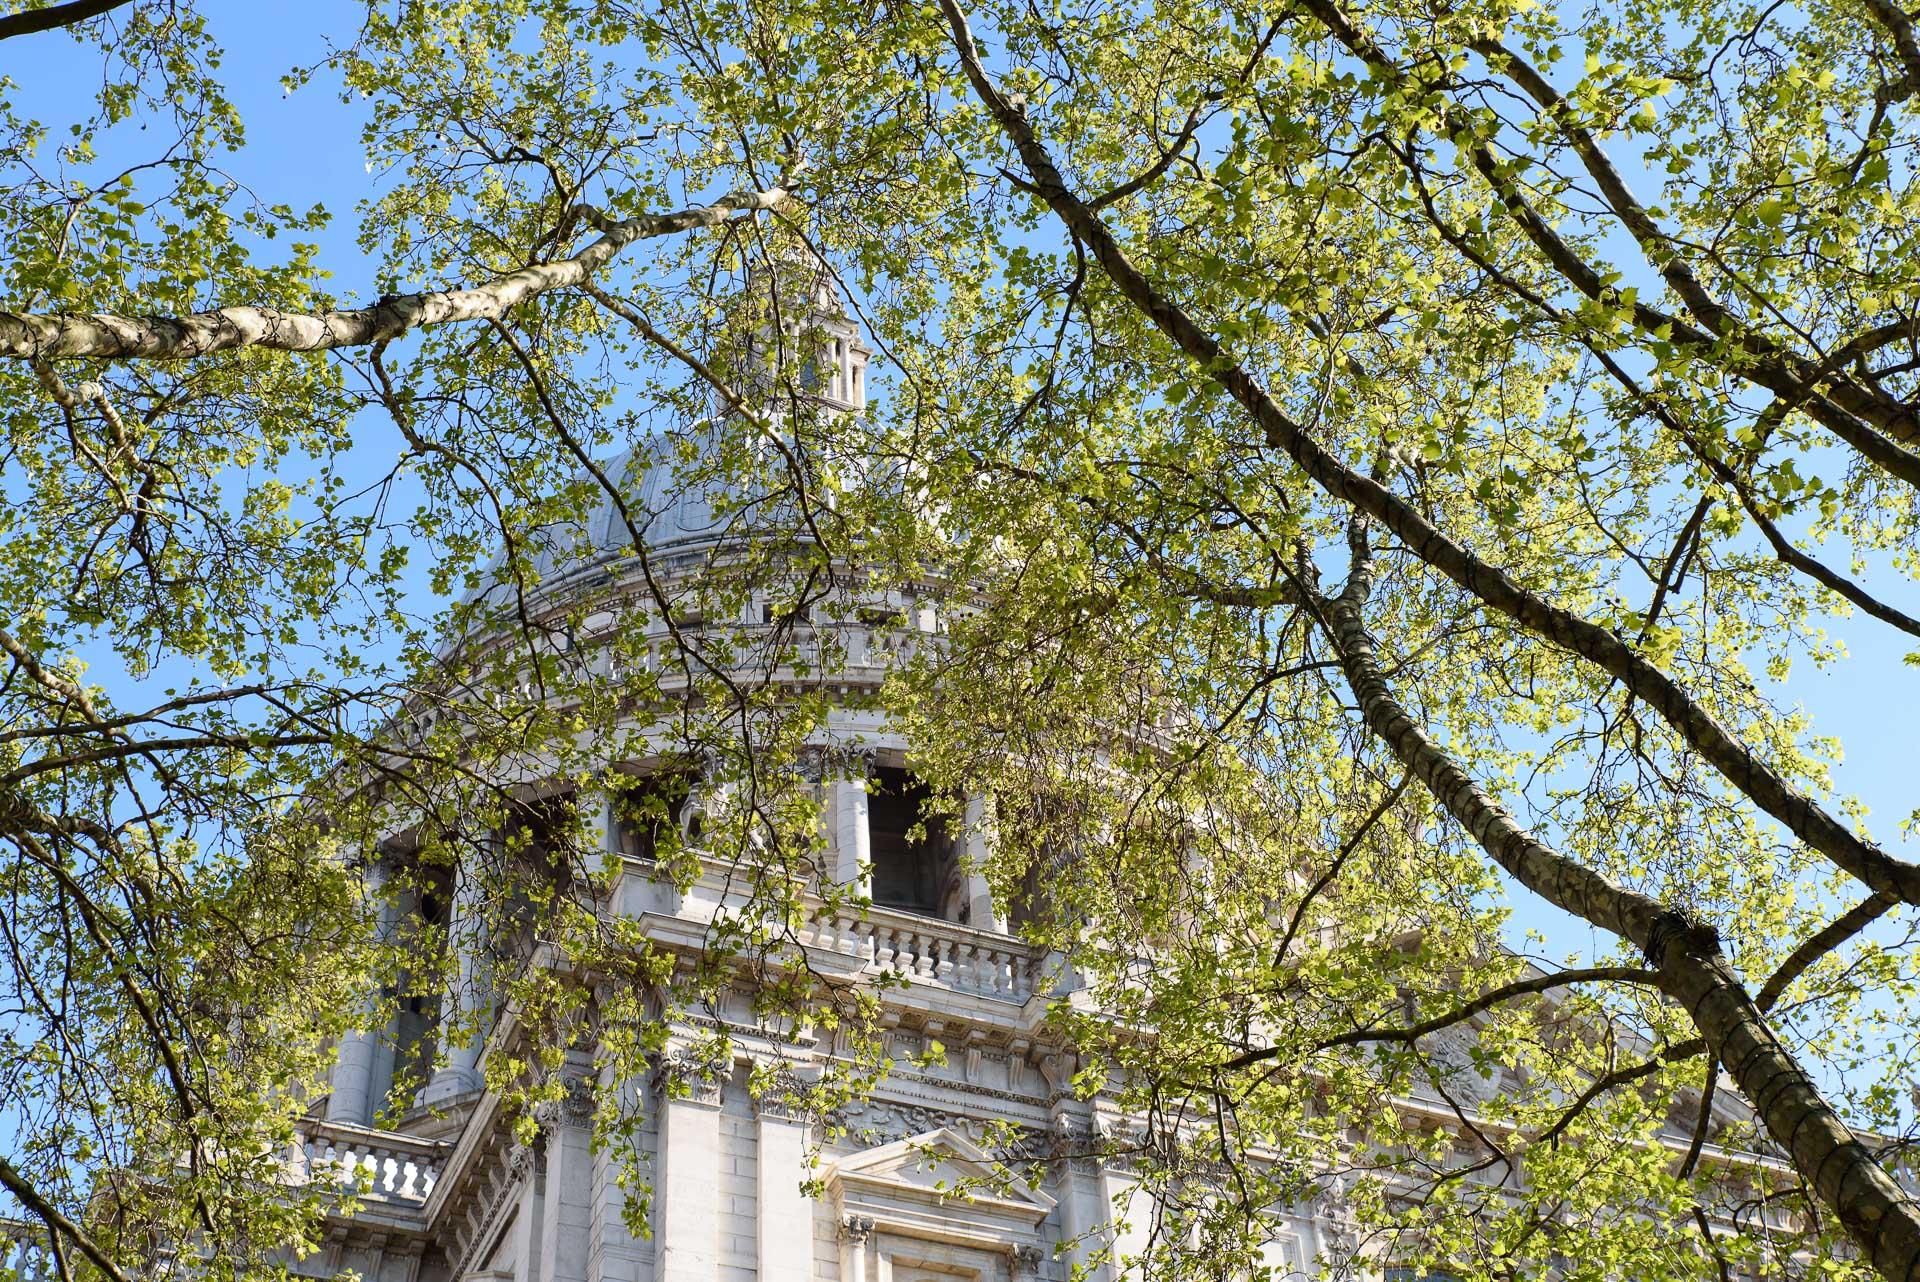 Die Kuppel der St. Paul's Cathedral